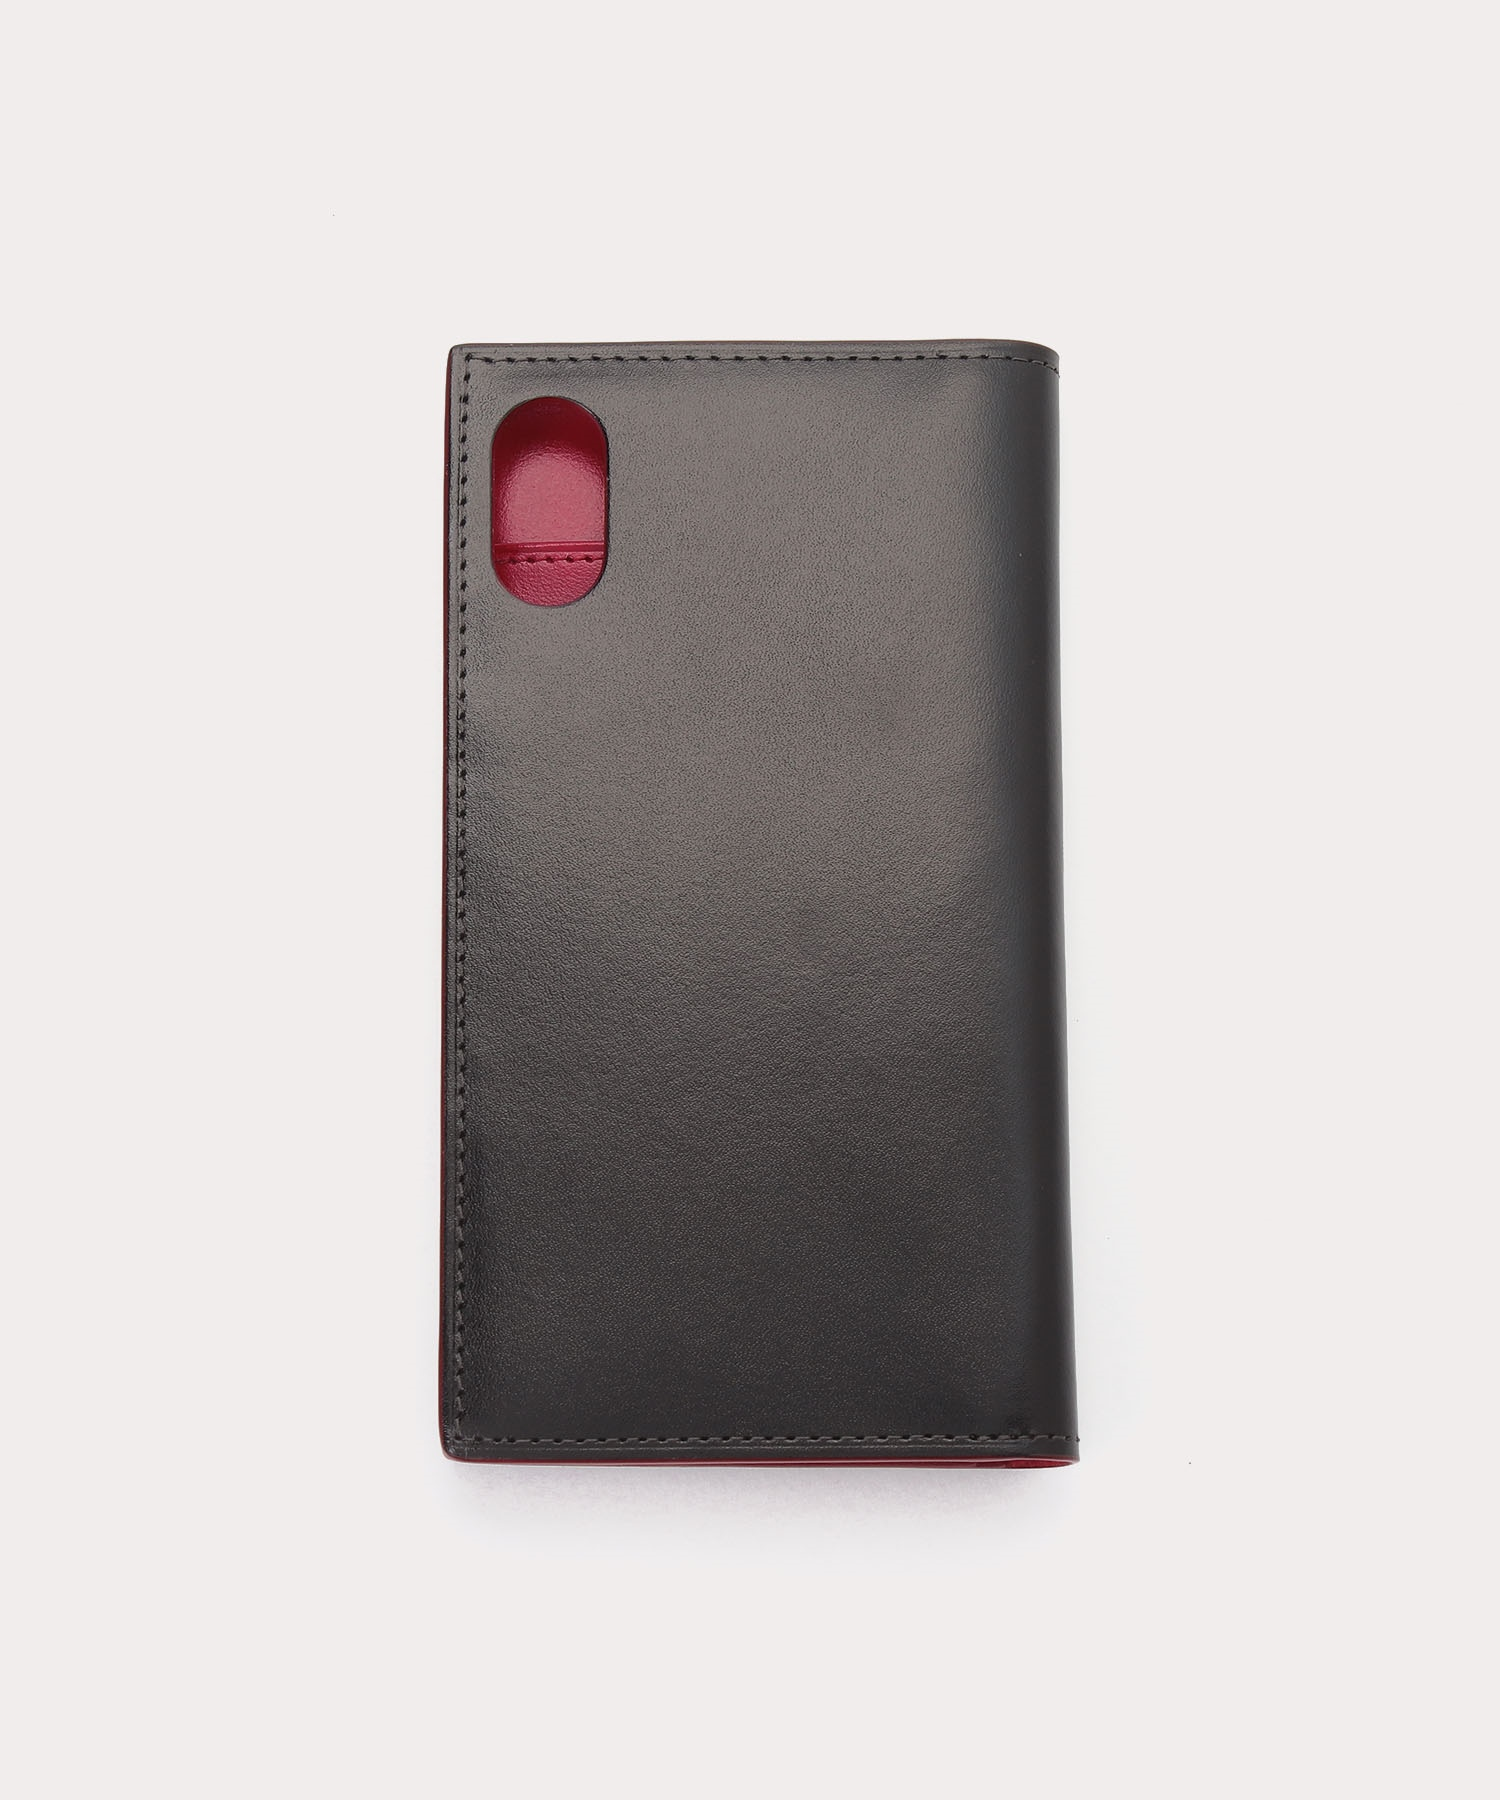 【iPhone X用】SIMPLE TINY ORB スマホケース